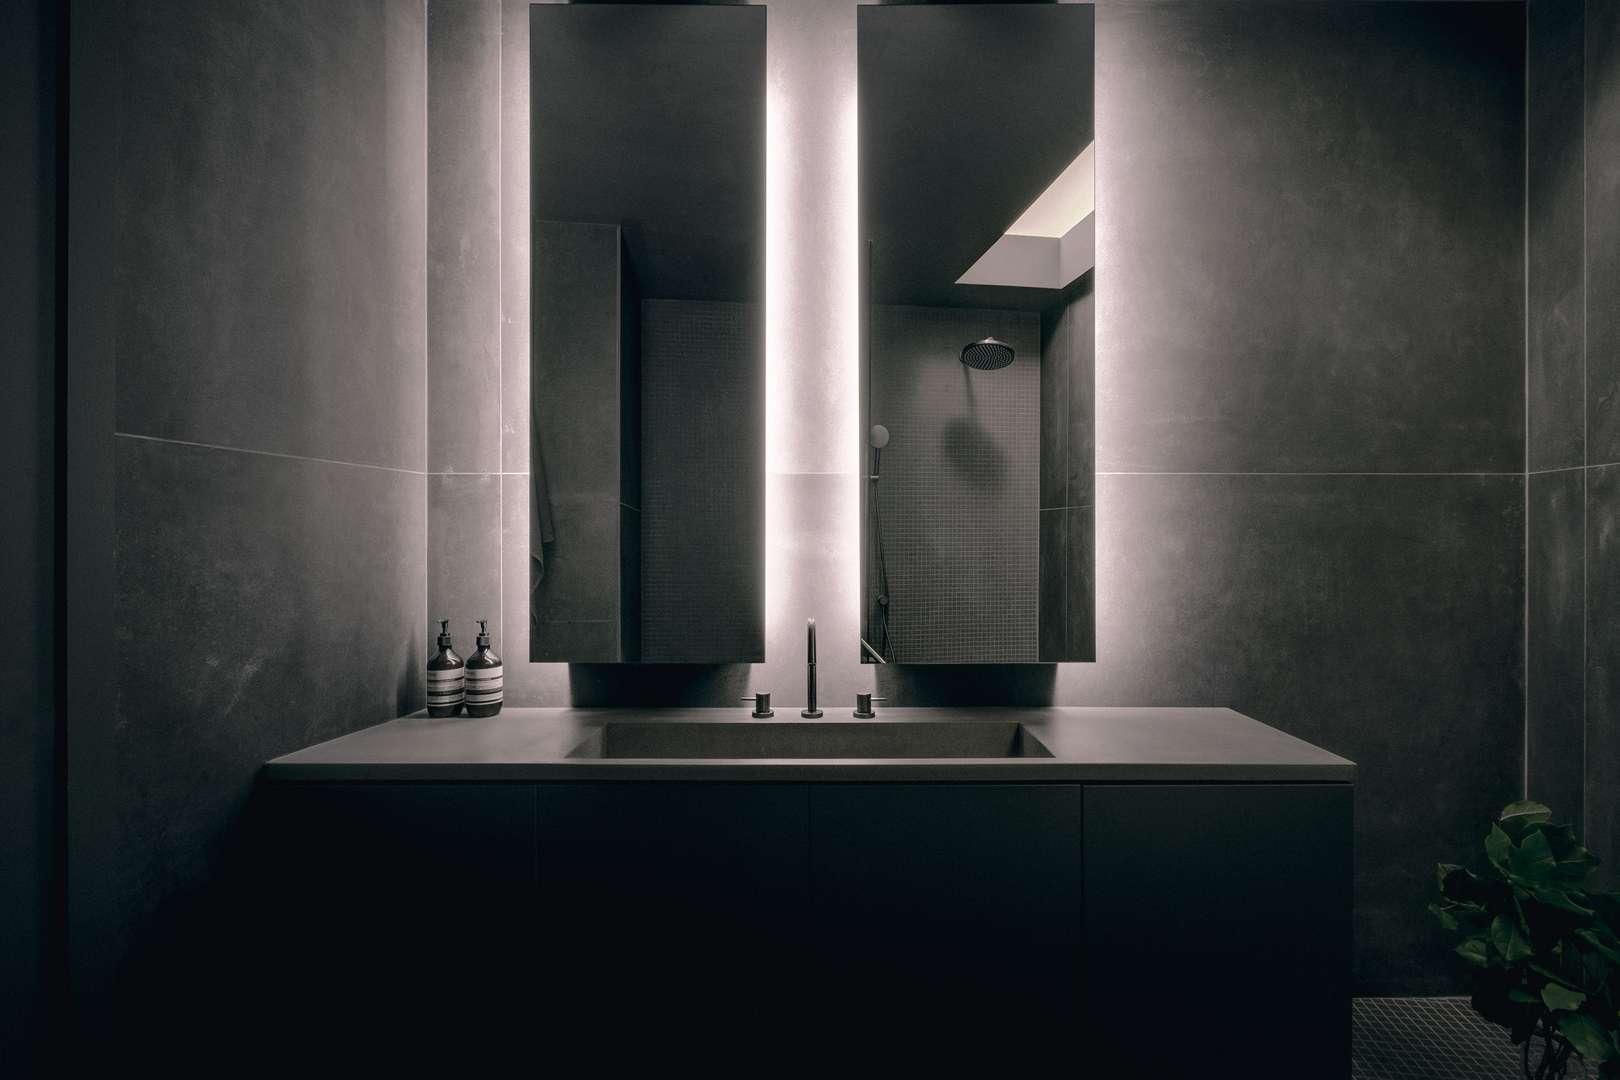 montreal-loft-renovation-by-future-simple-studio-interiors-canada_dezeen_2364_col_0